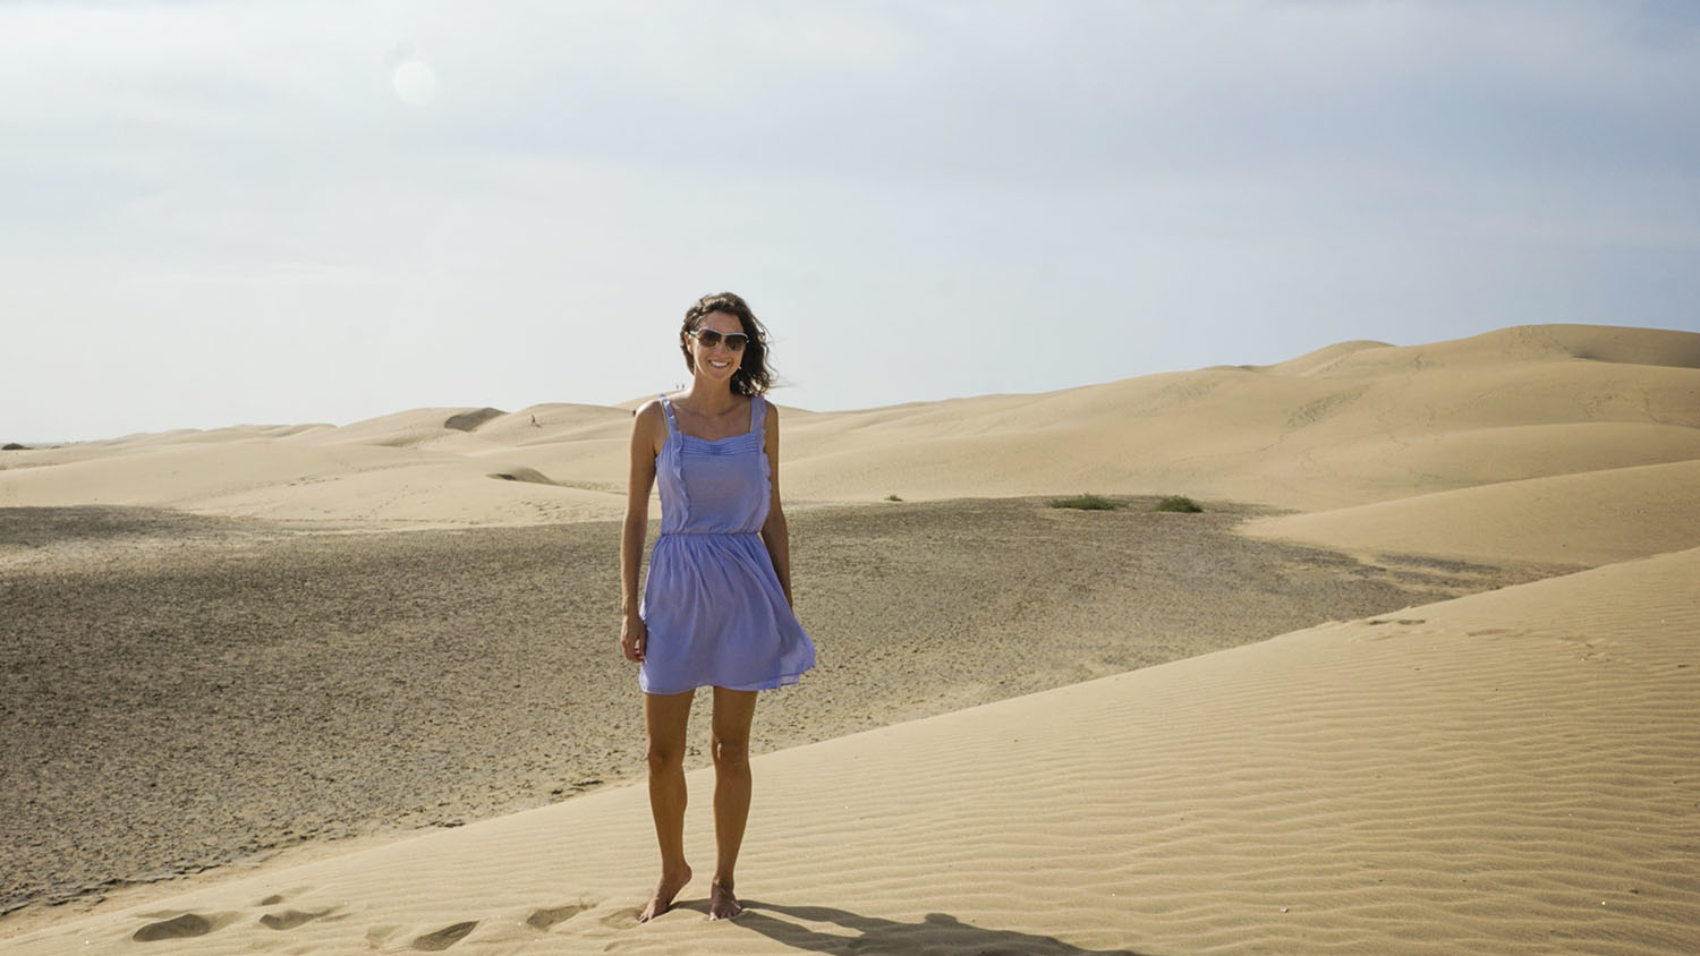 Jessica at Maspalomas Dunes